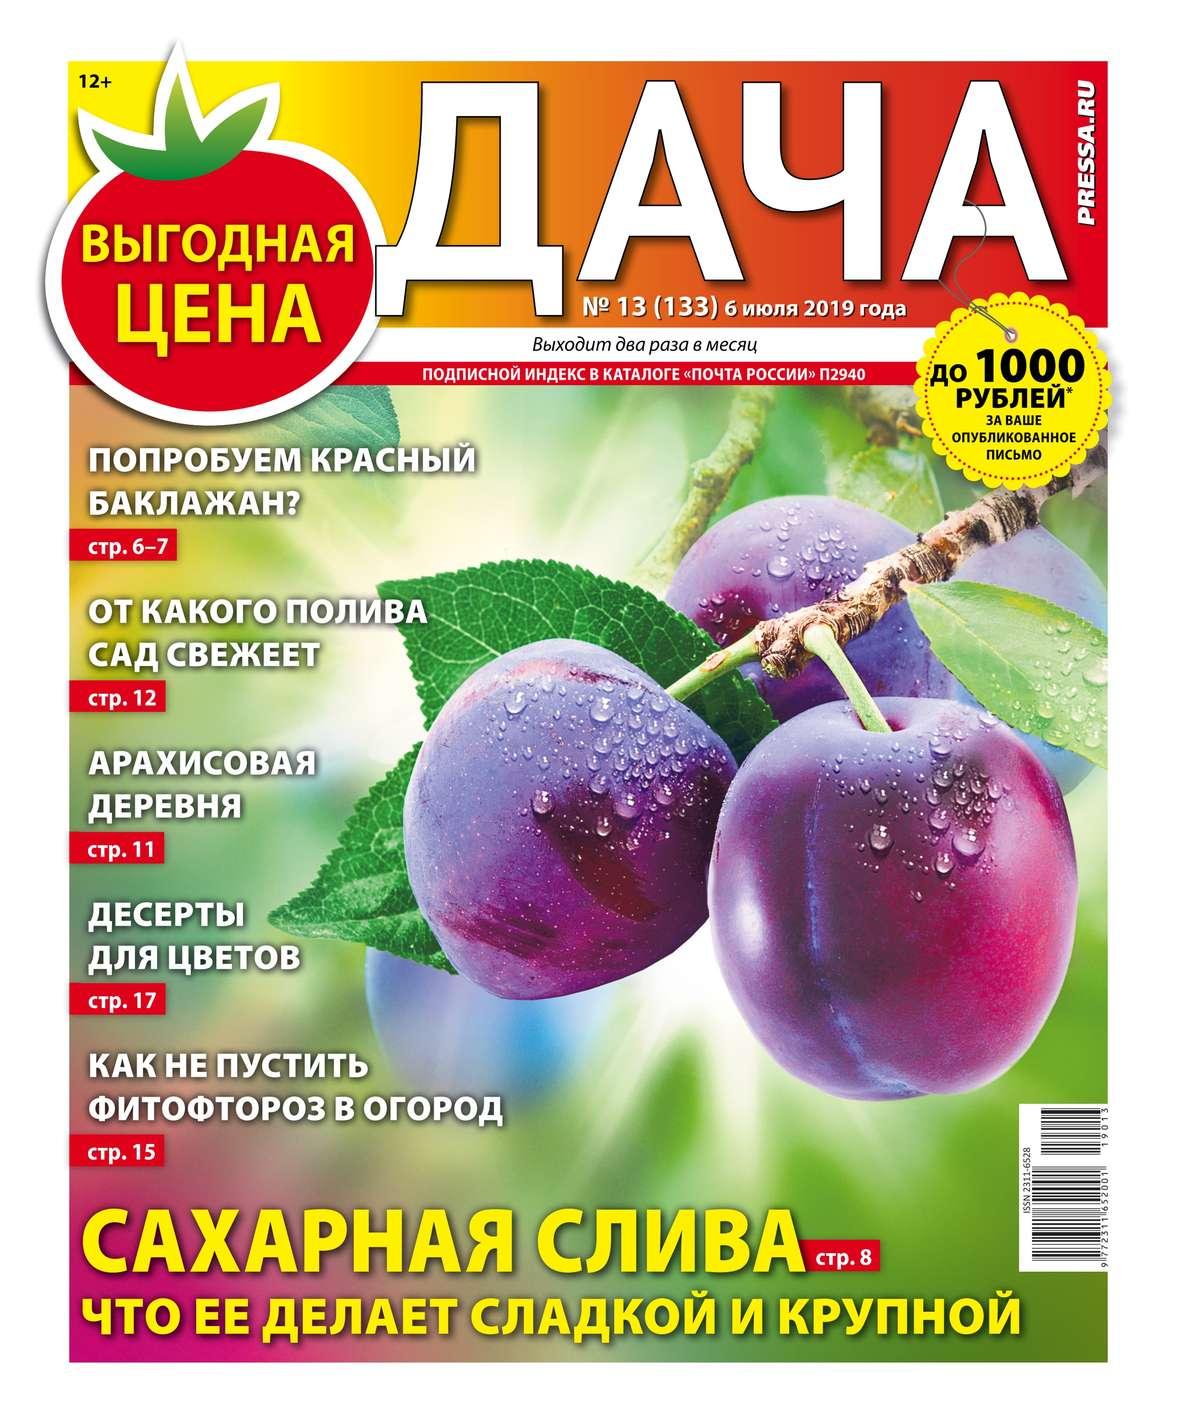 цена Редакция газеты Дача Pressa.ru Дача Pressa.ru 13-2019